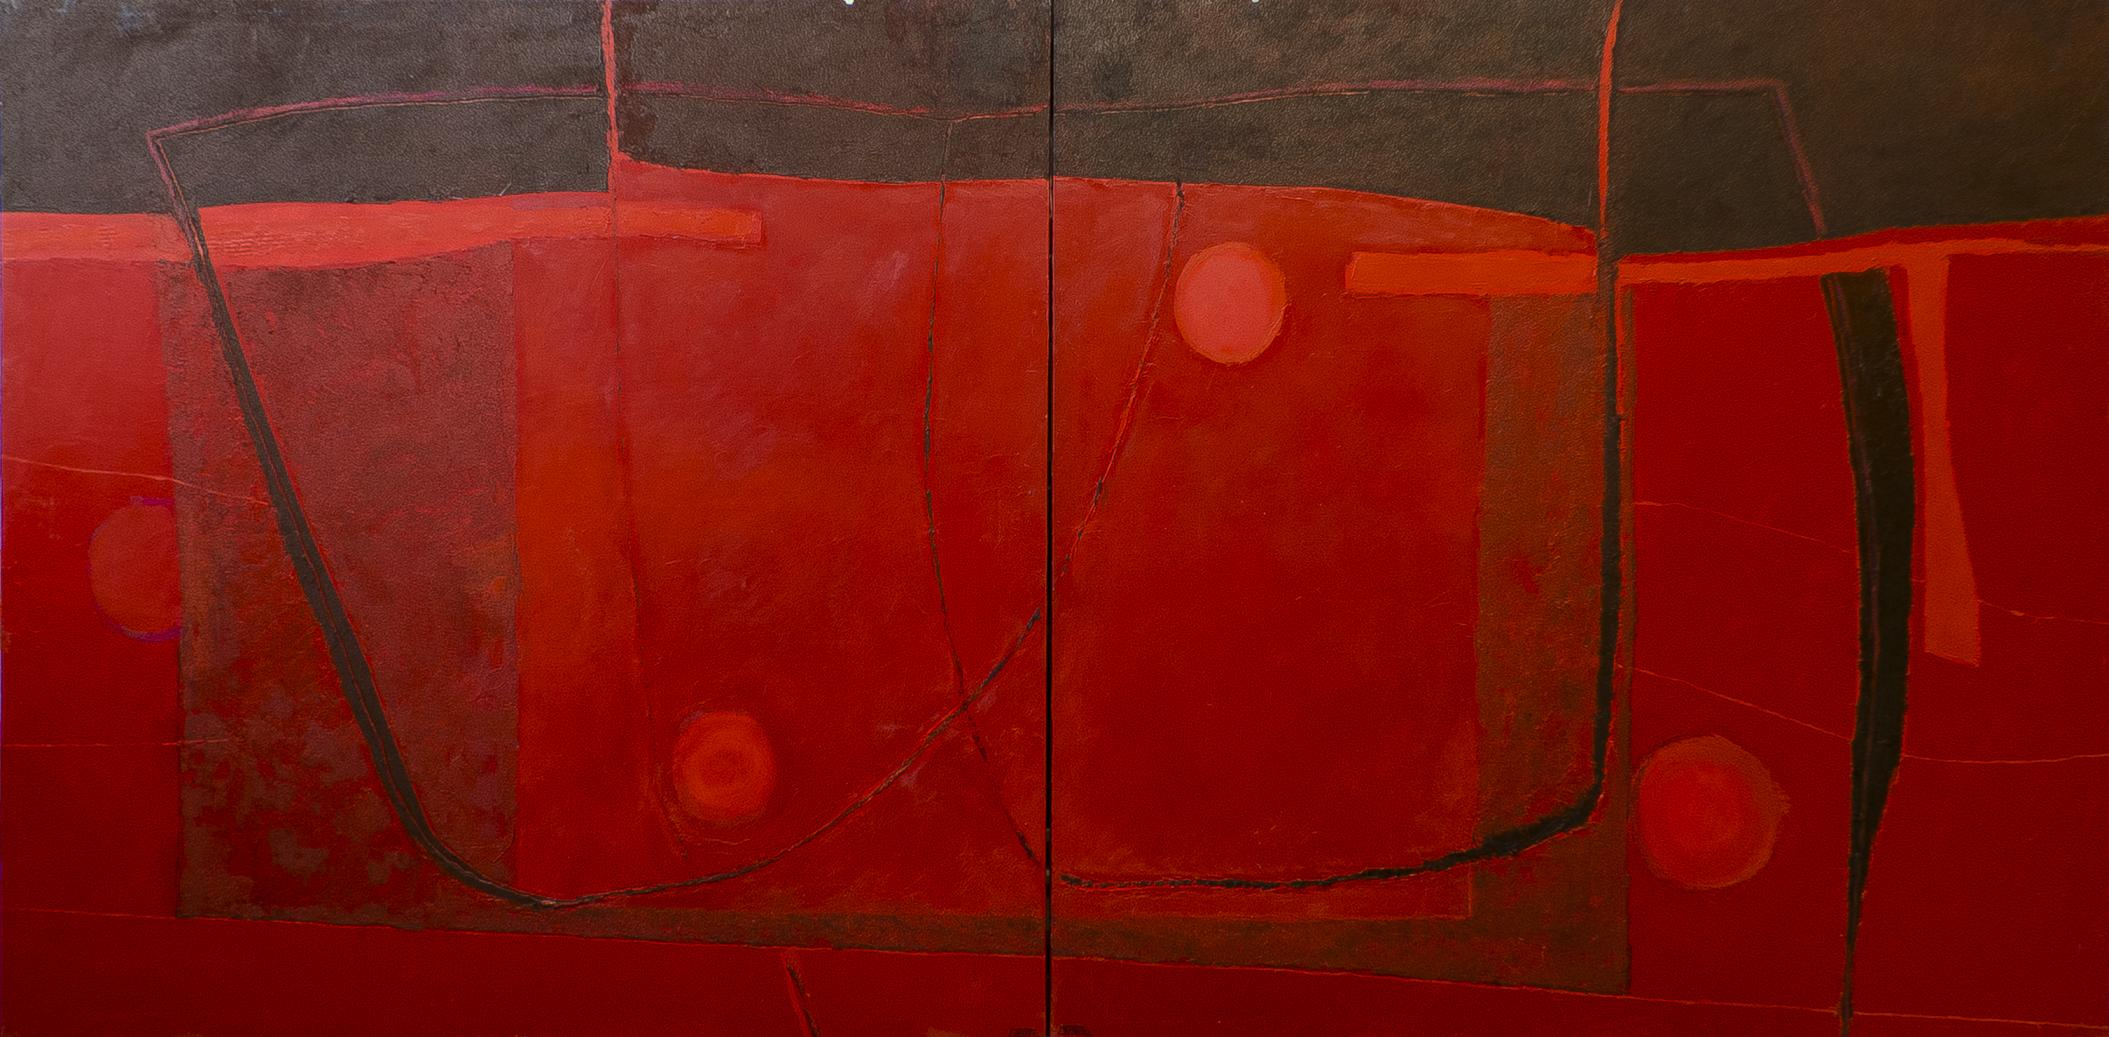 Rojo 1 y 2 (Diptico) (2014) - Pedro Carrasco